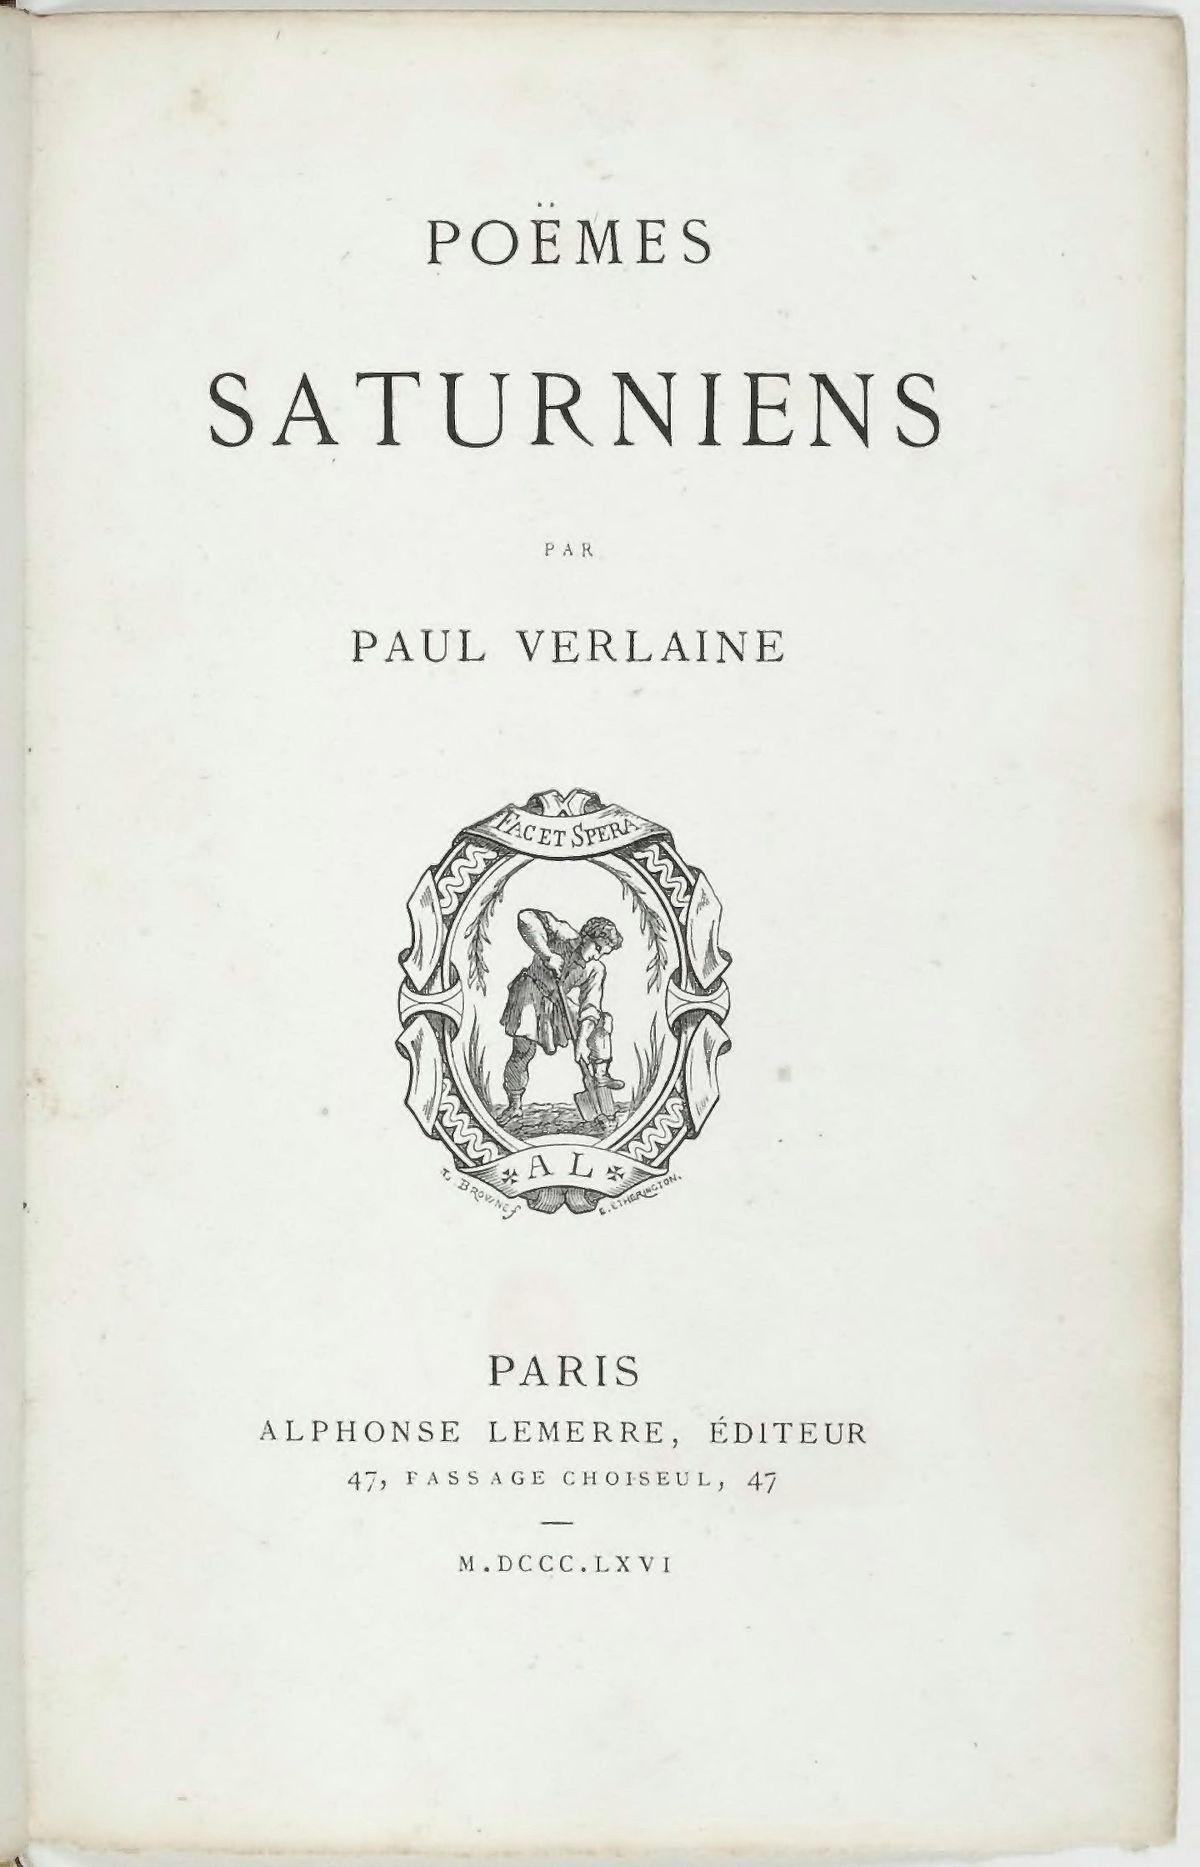 dissertation poèmes saturniens